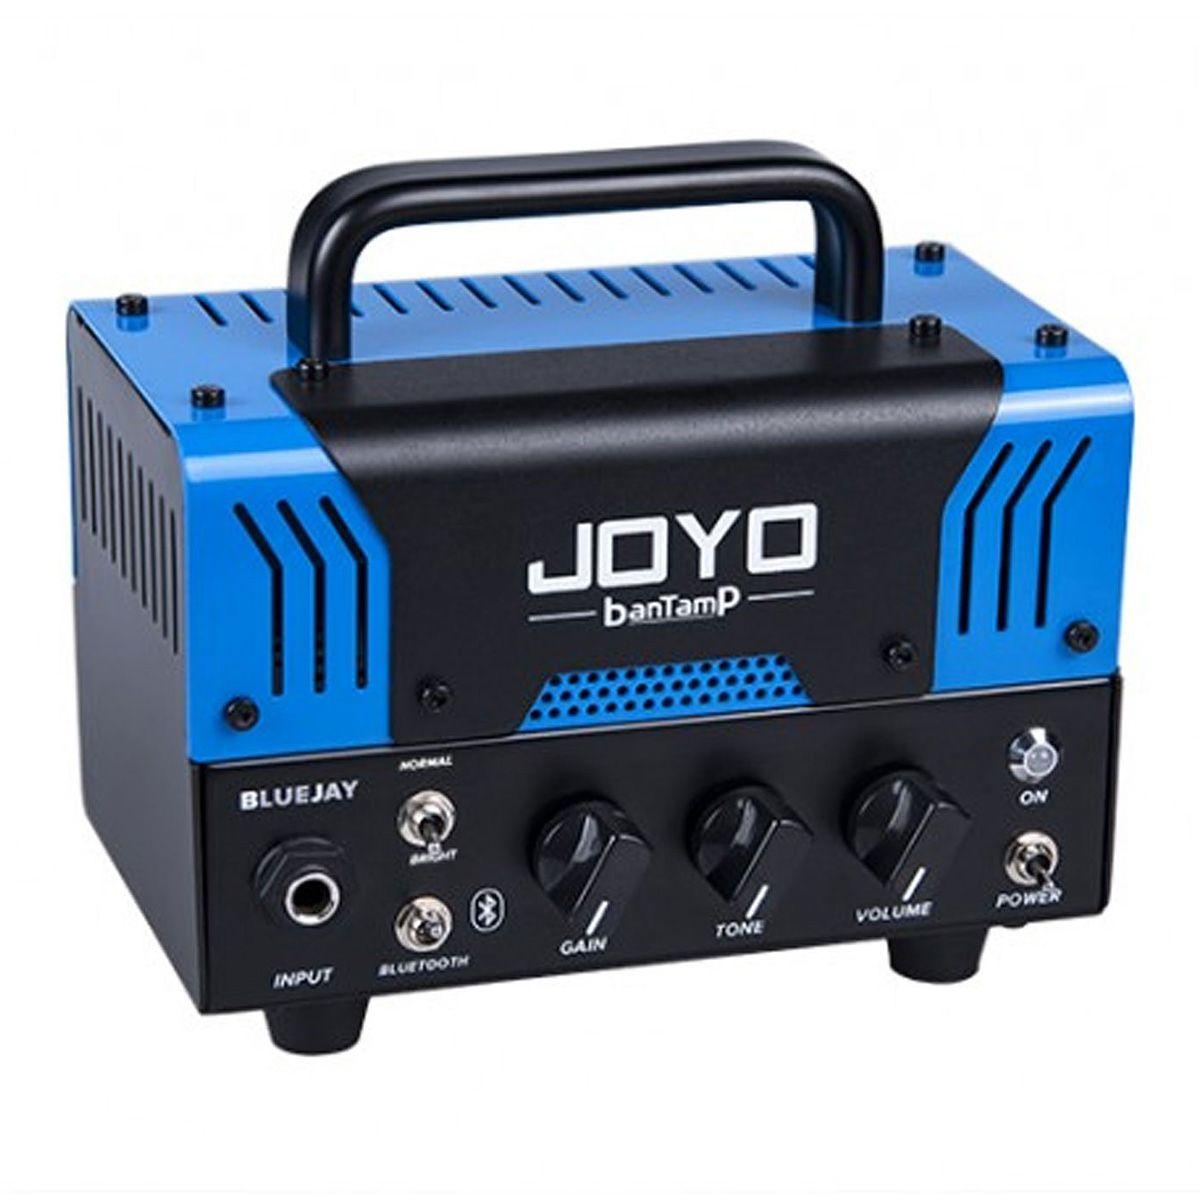 Mini Amplificador JOYO BLUEJAY BantamP 20W para Guitarra